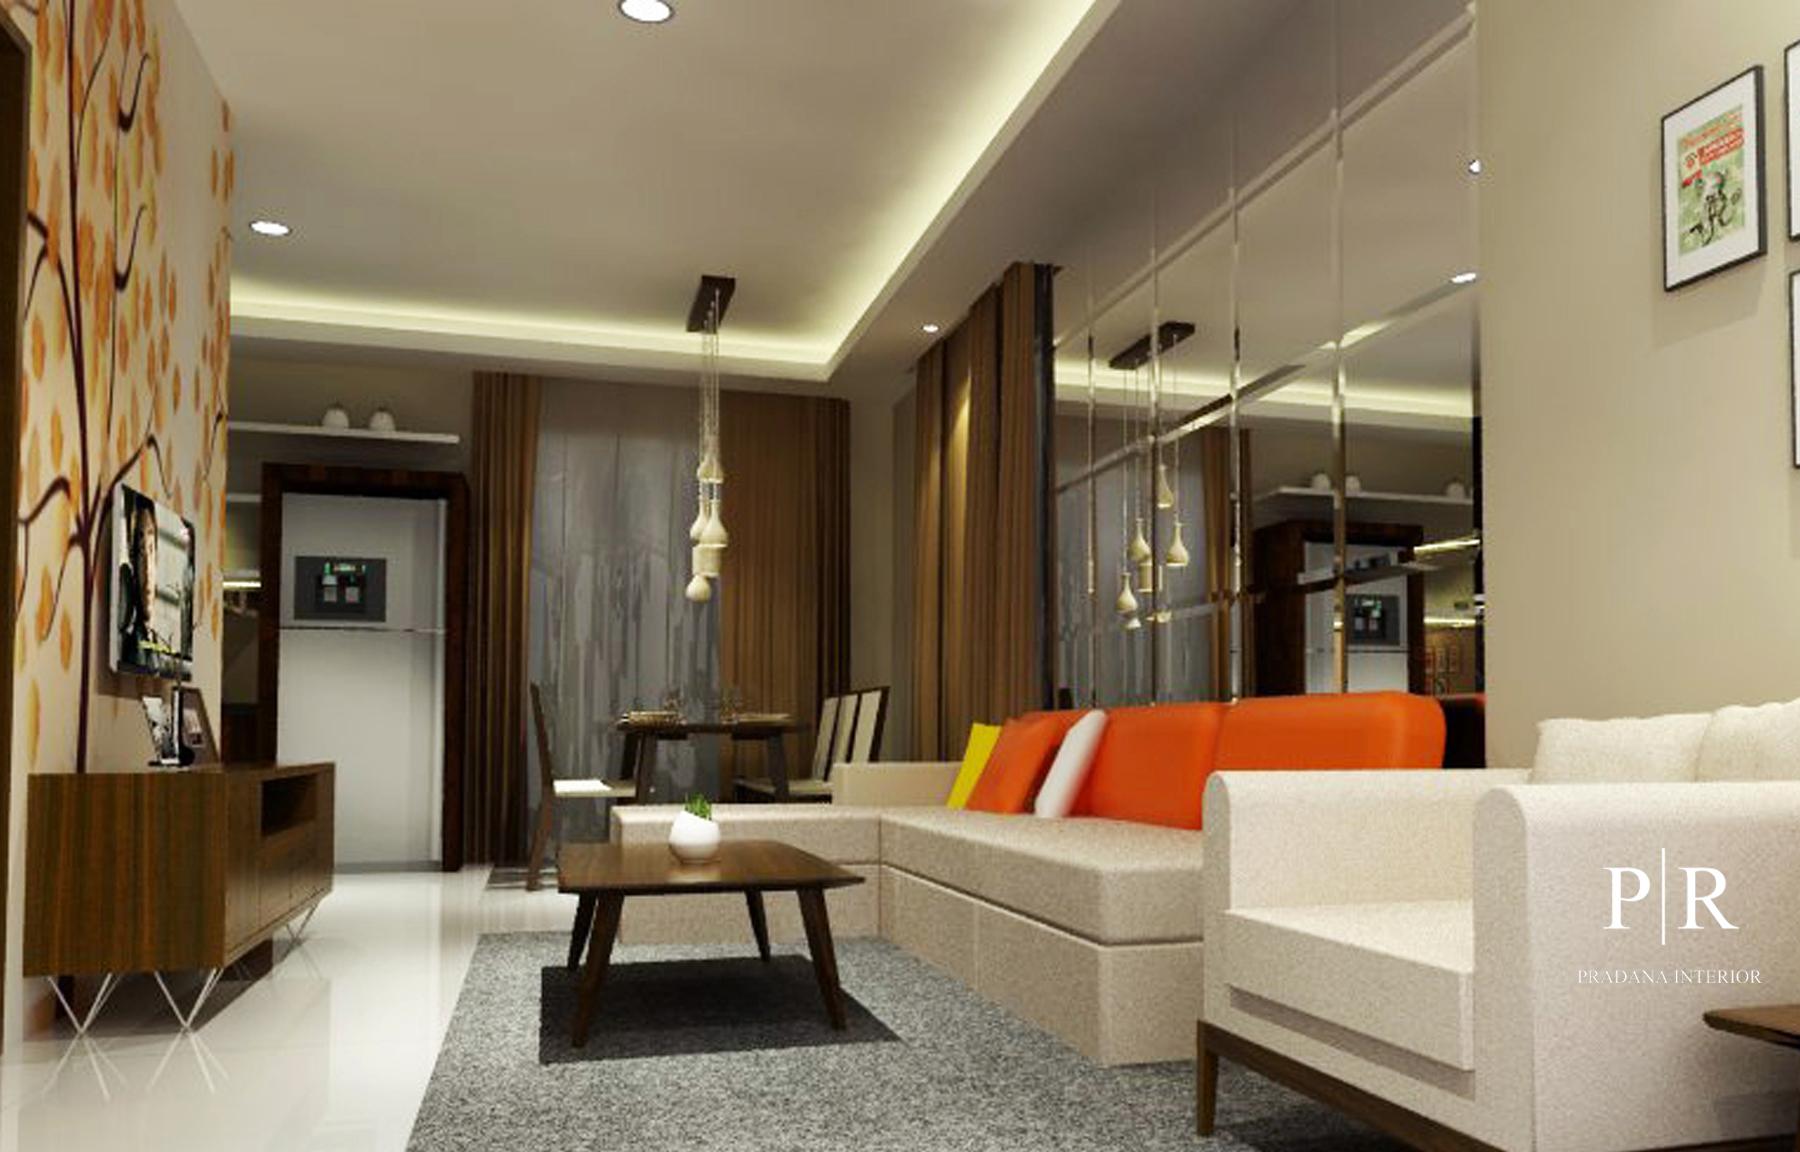 Jasa Desain Interior Apartemen Jakarta - Living room 2